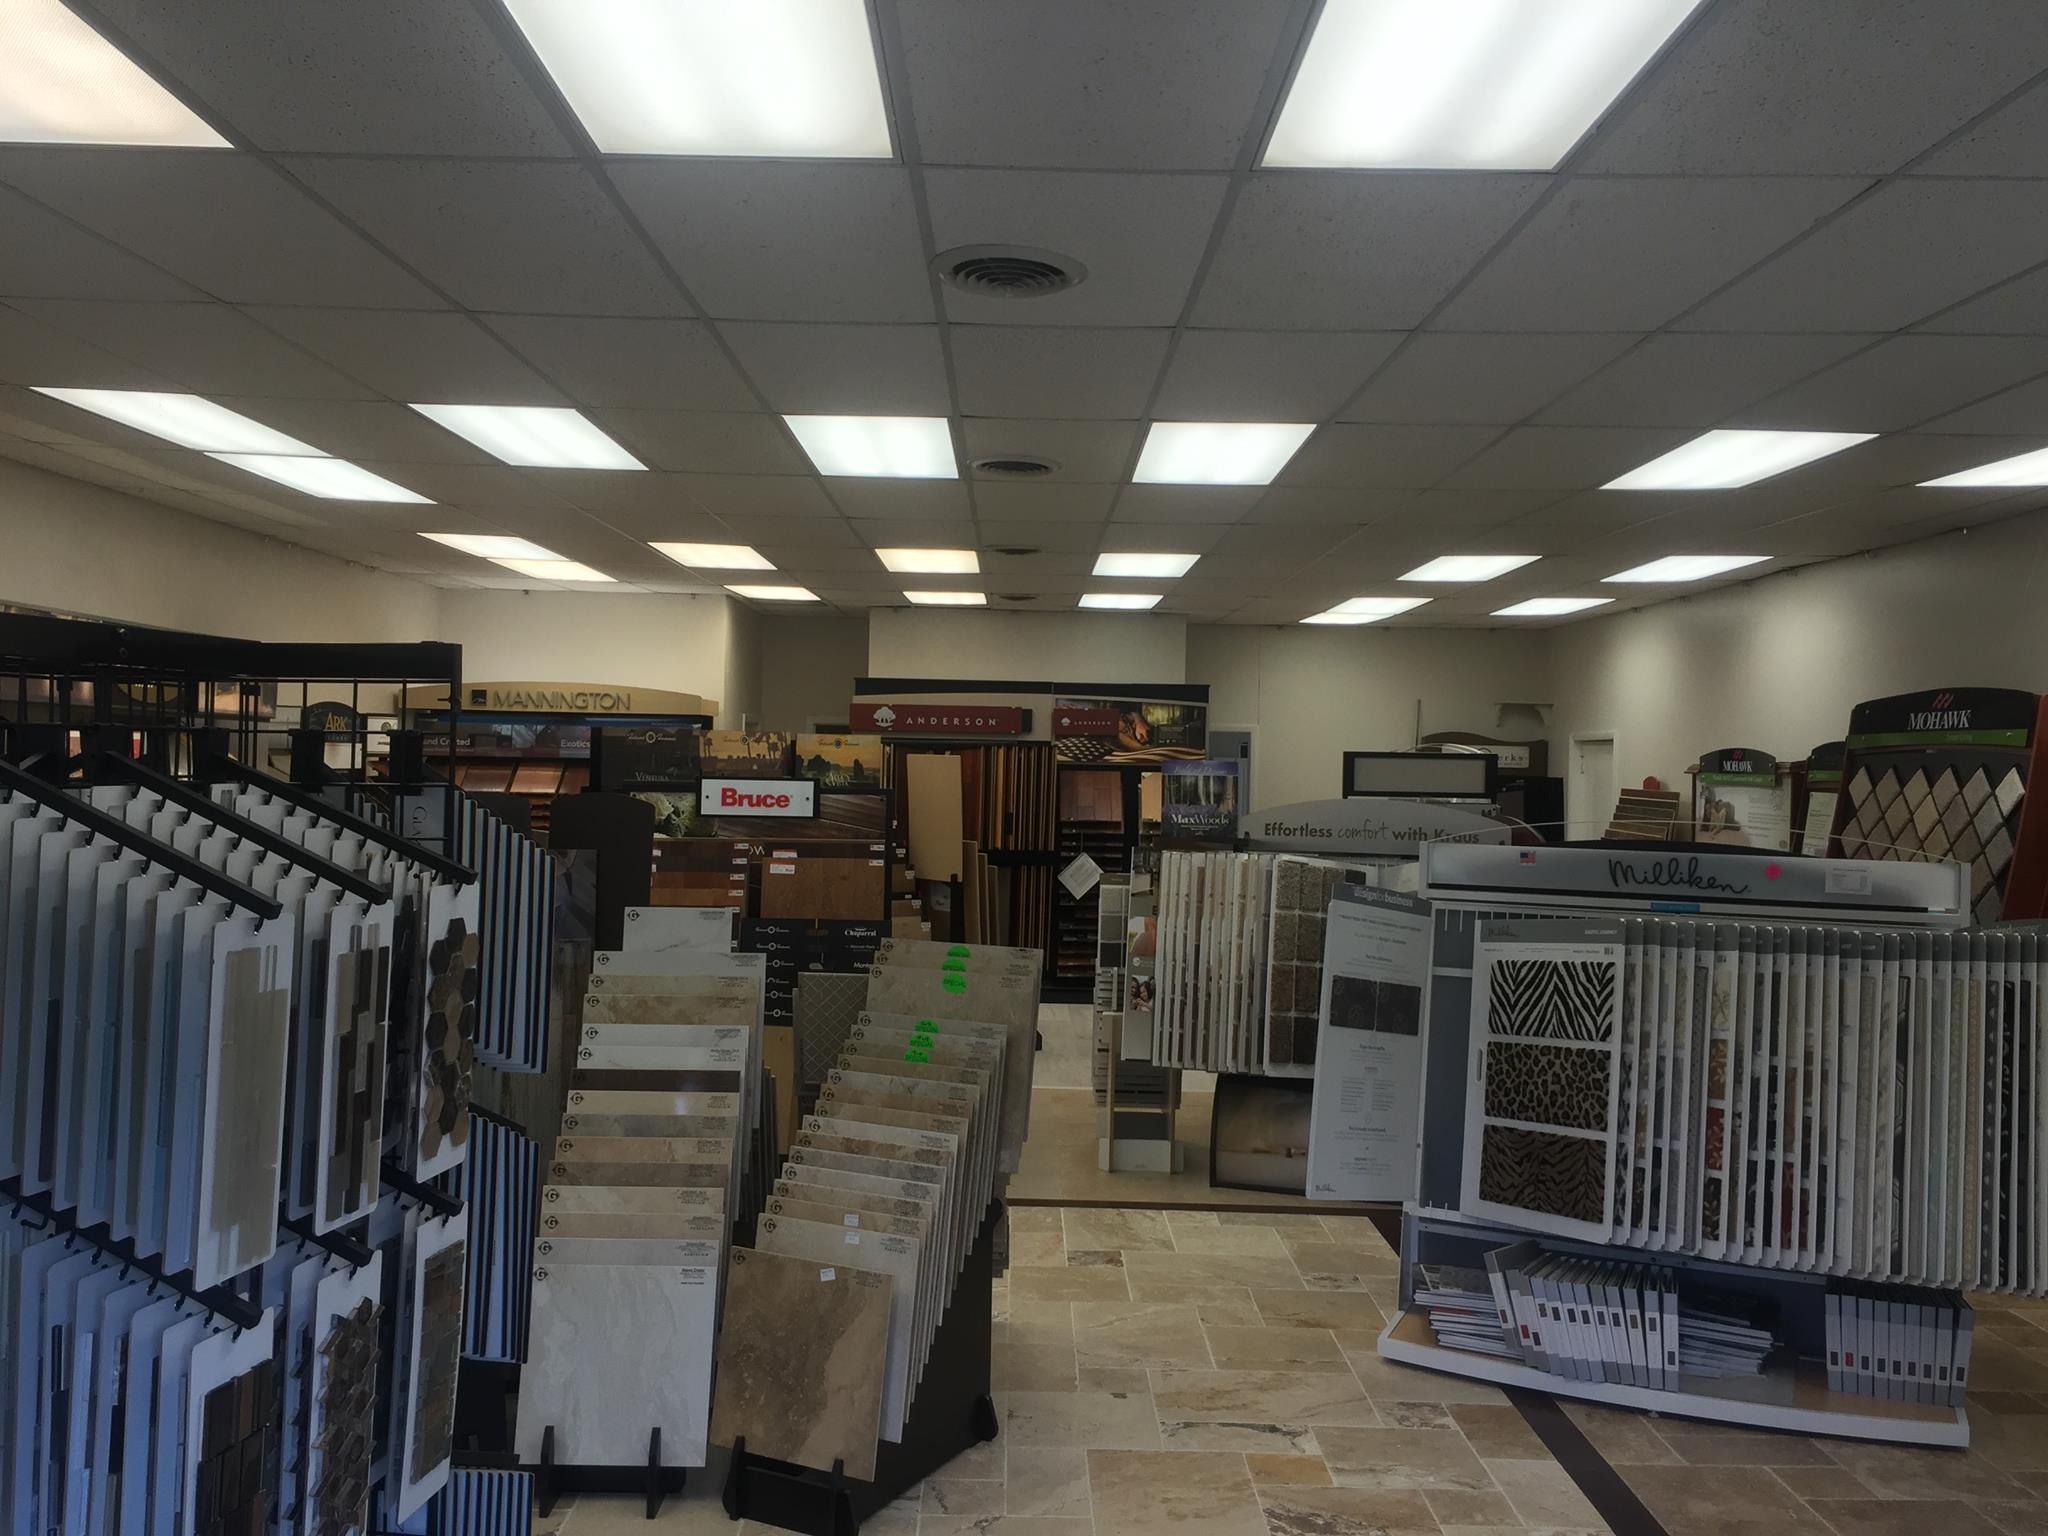 James Flooring - 5225 US-1, St. Augustine, FL 32086